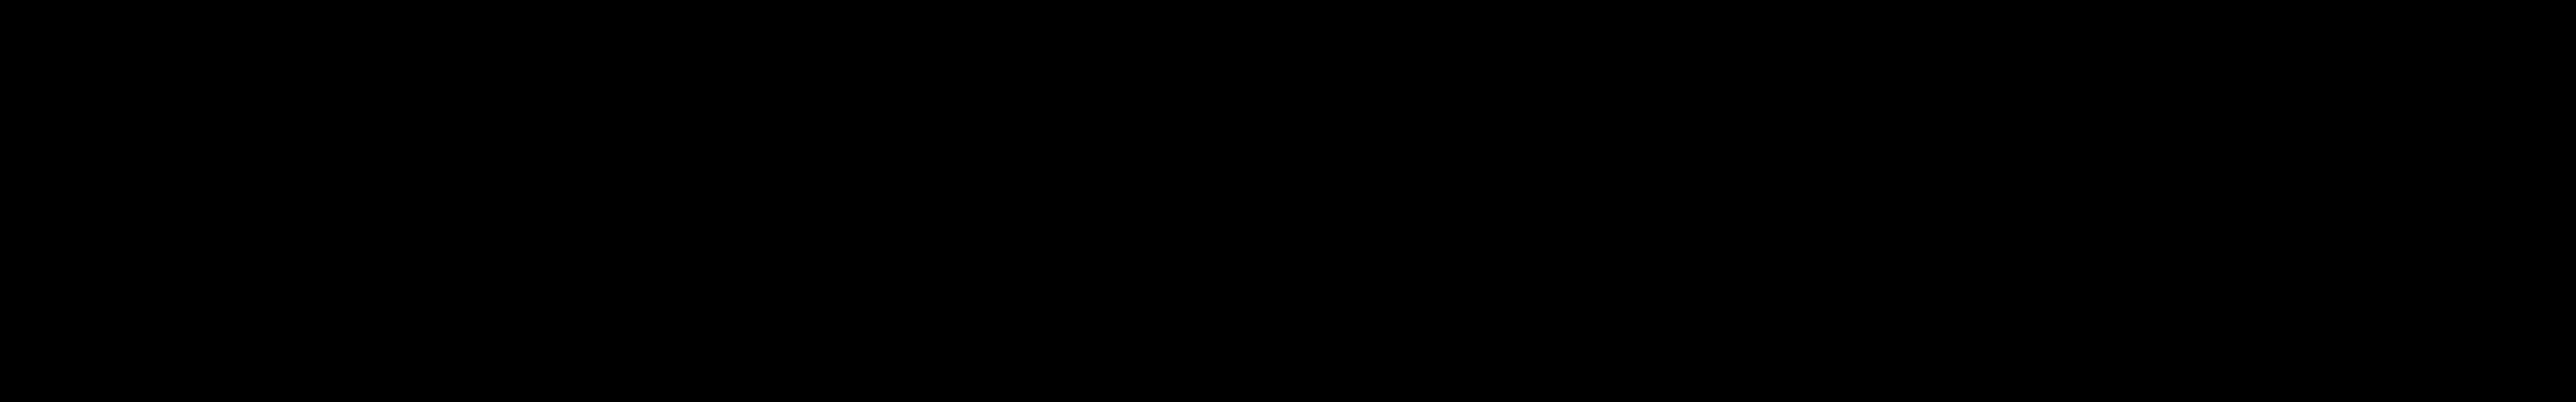 distrokid logos png jpg eps vector distrokid logos png jpg eps vector